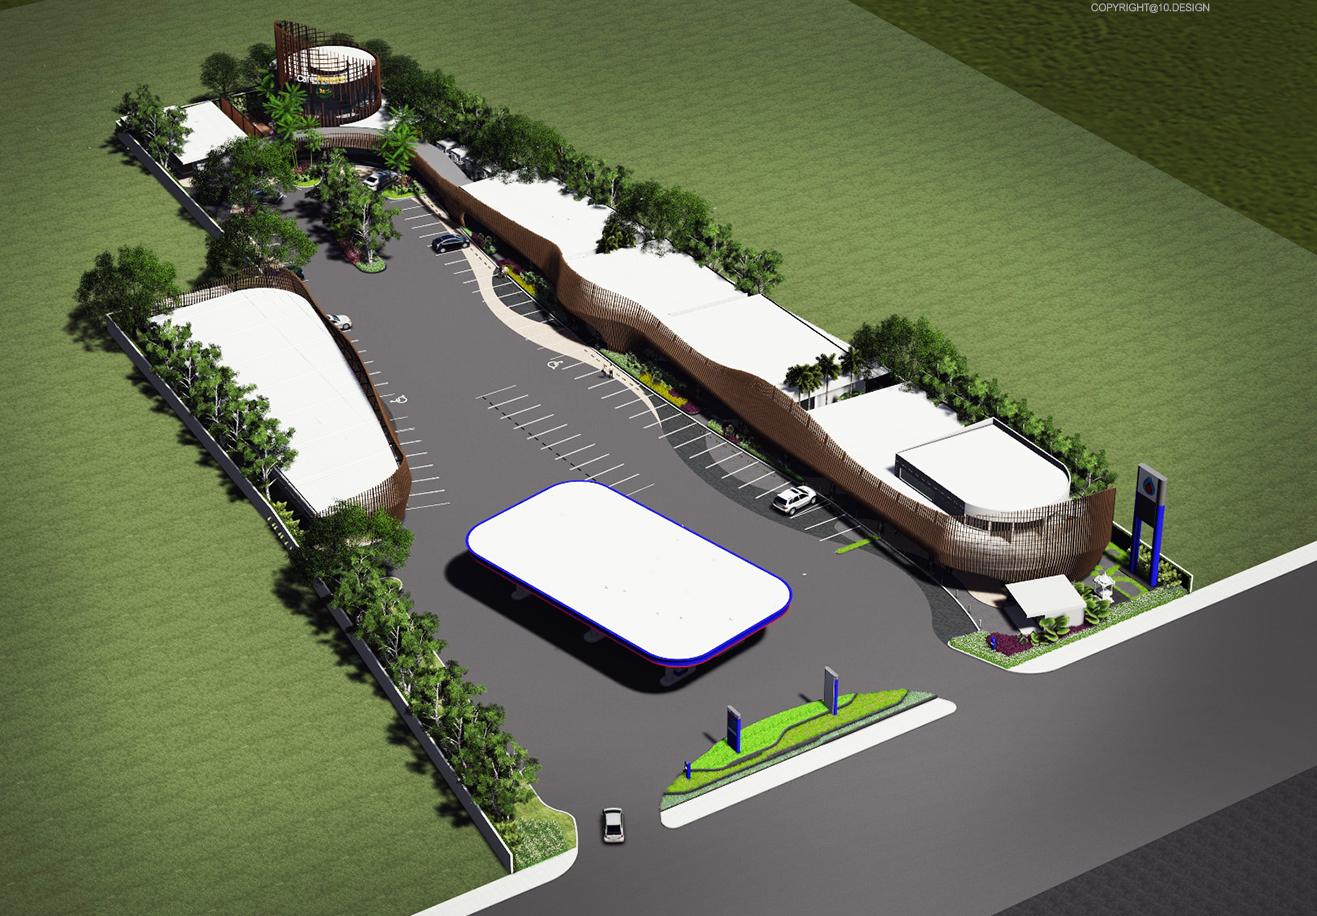 10DESIGN PTT GAS STATION LANDSCAPE ARCHITECT DESIGN PROJECT 01